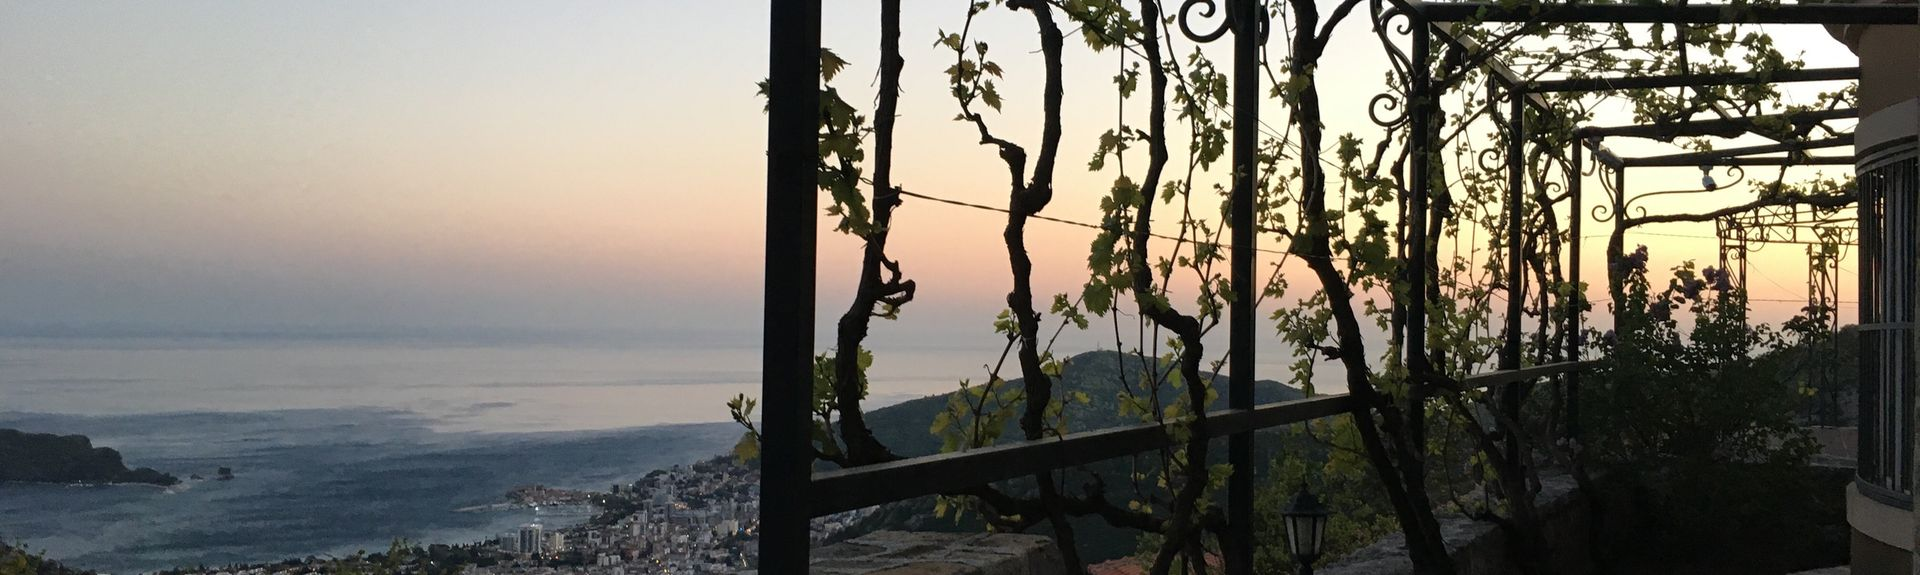 Dobrota, Kotor Kommune, Montenegro